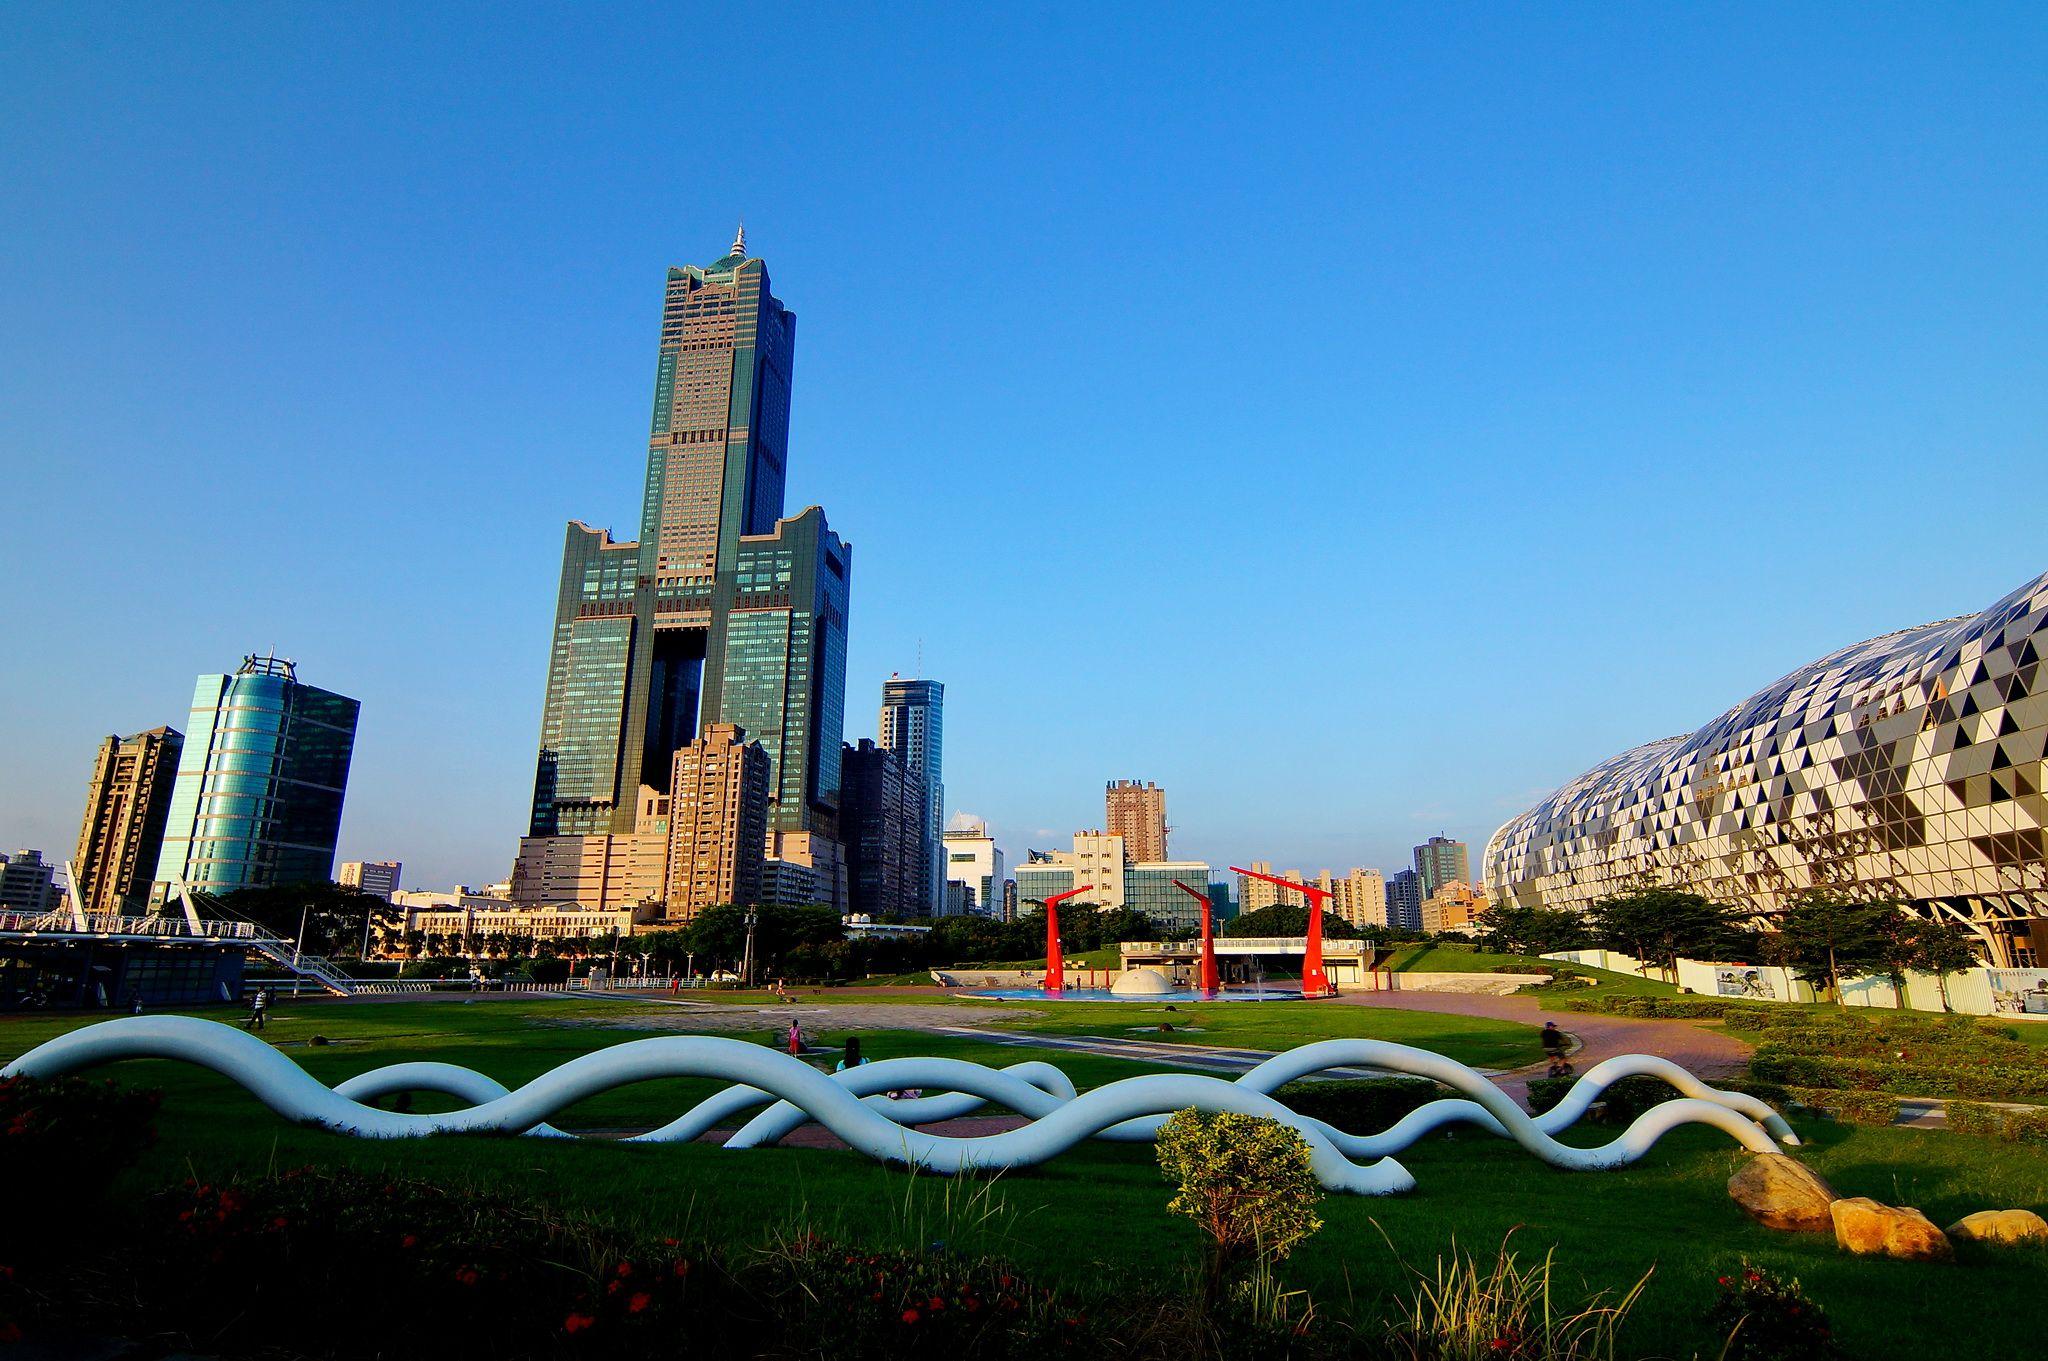 高雄85大樓 by chenxhao50